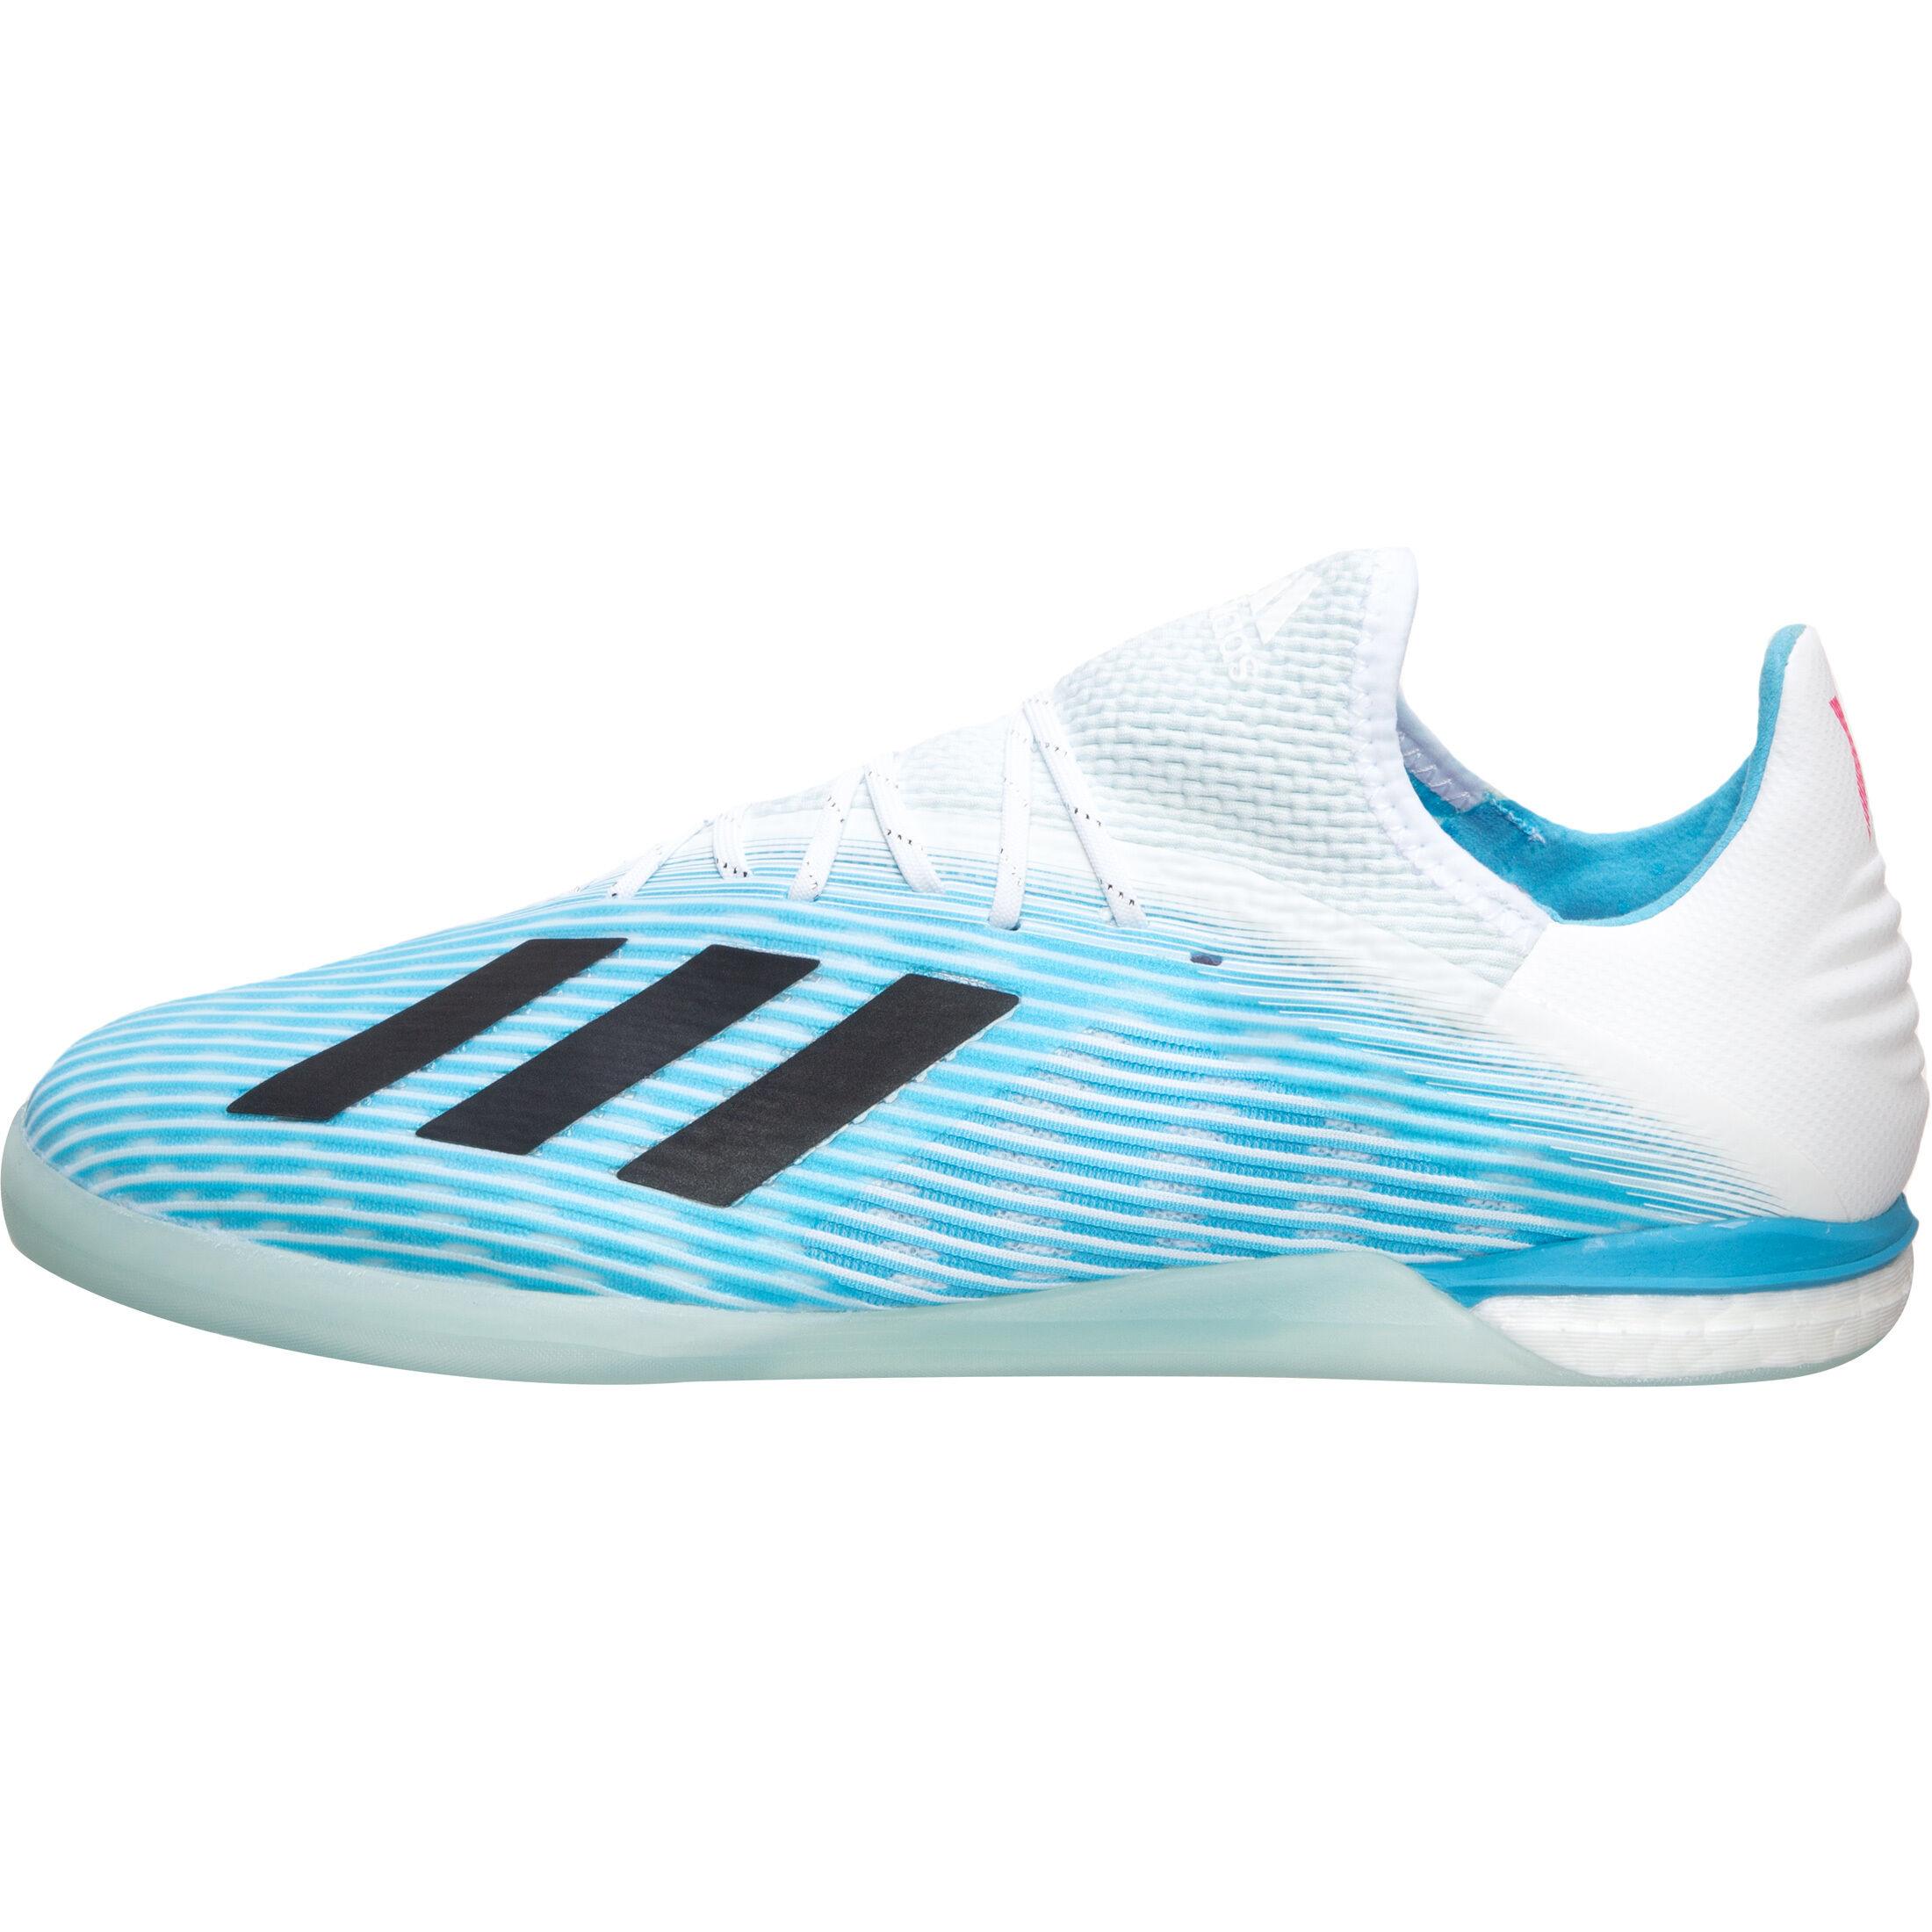 adidas Performance X 19.1 Indoor Fußballschuh Herren bei